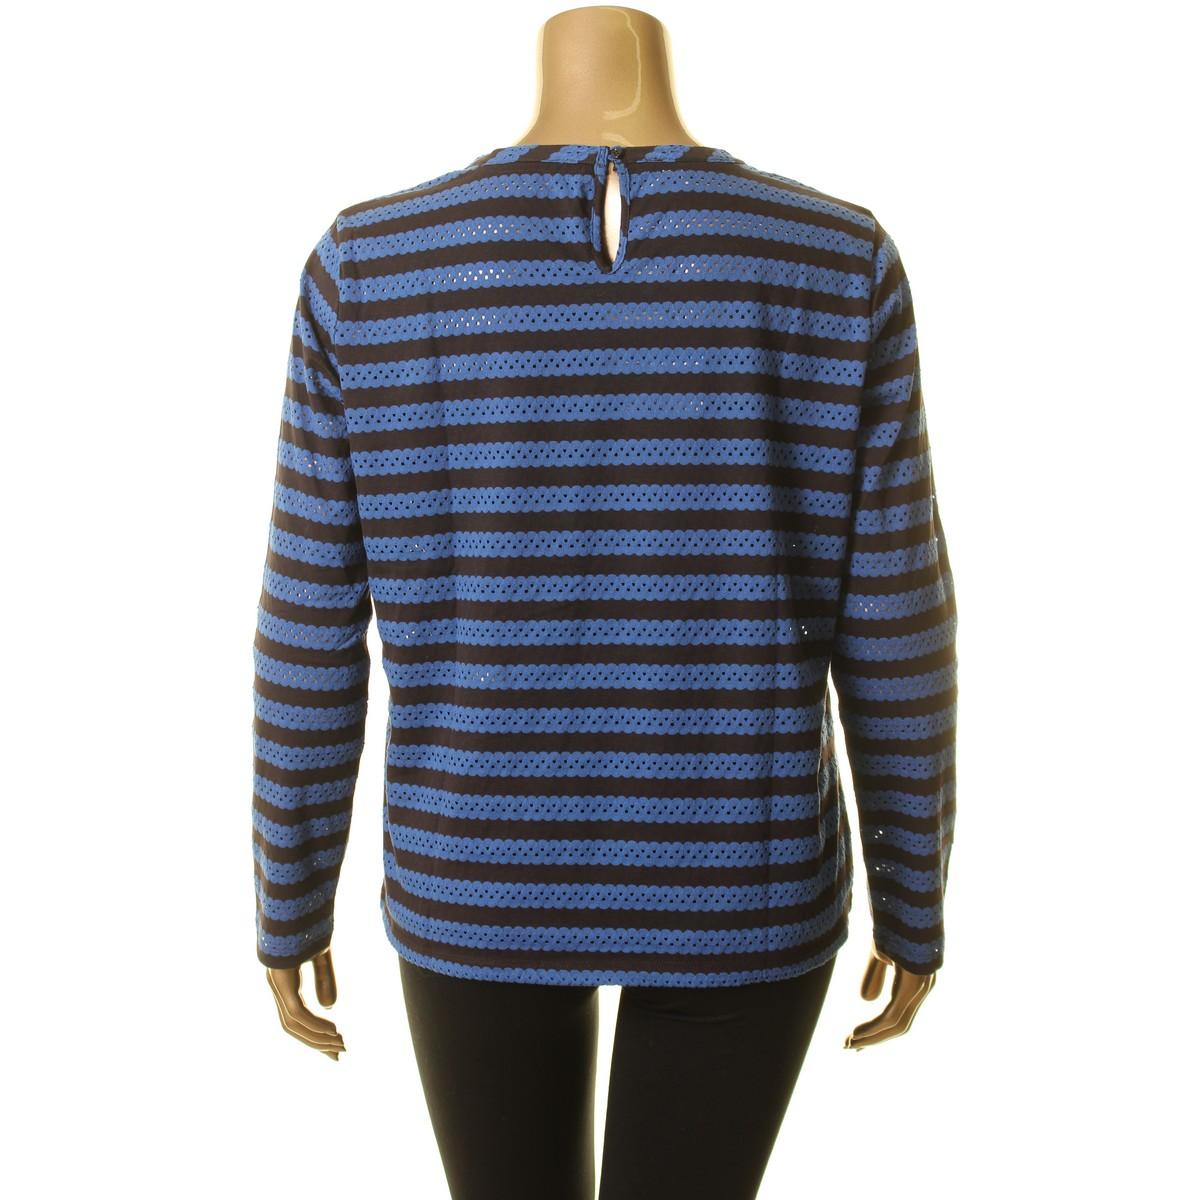 ANNE-KLEIN-NEW-Women-039-s-Eyelet-Striped-Casual-Shirt-Top-TEDO thumbnail 4